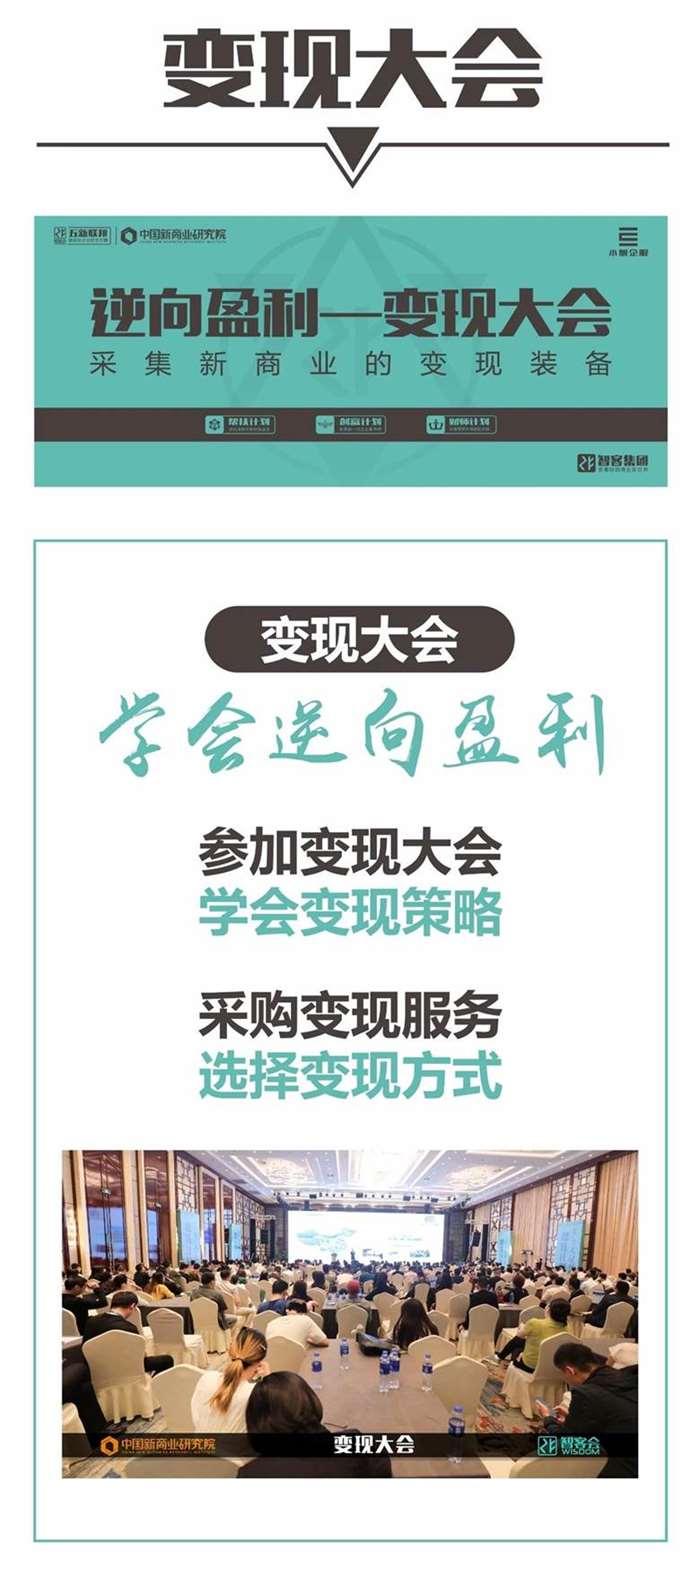 http://www.huodongxing.com/file/20191113/1063603644976/133643590003983.jpg